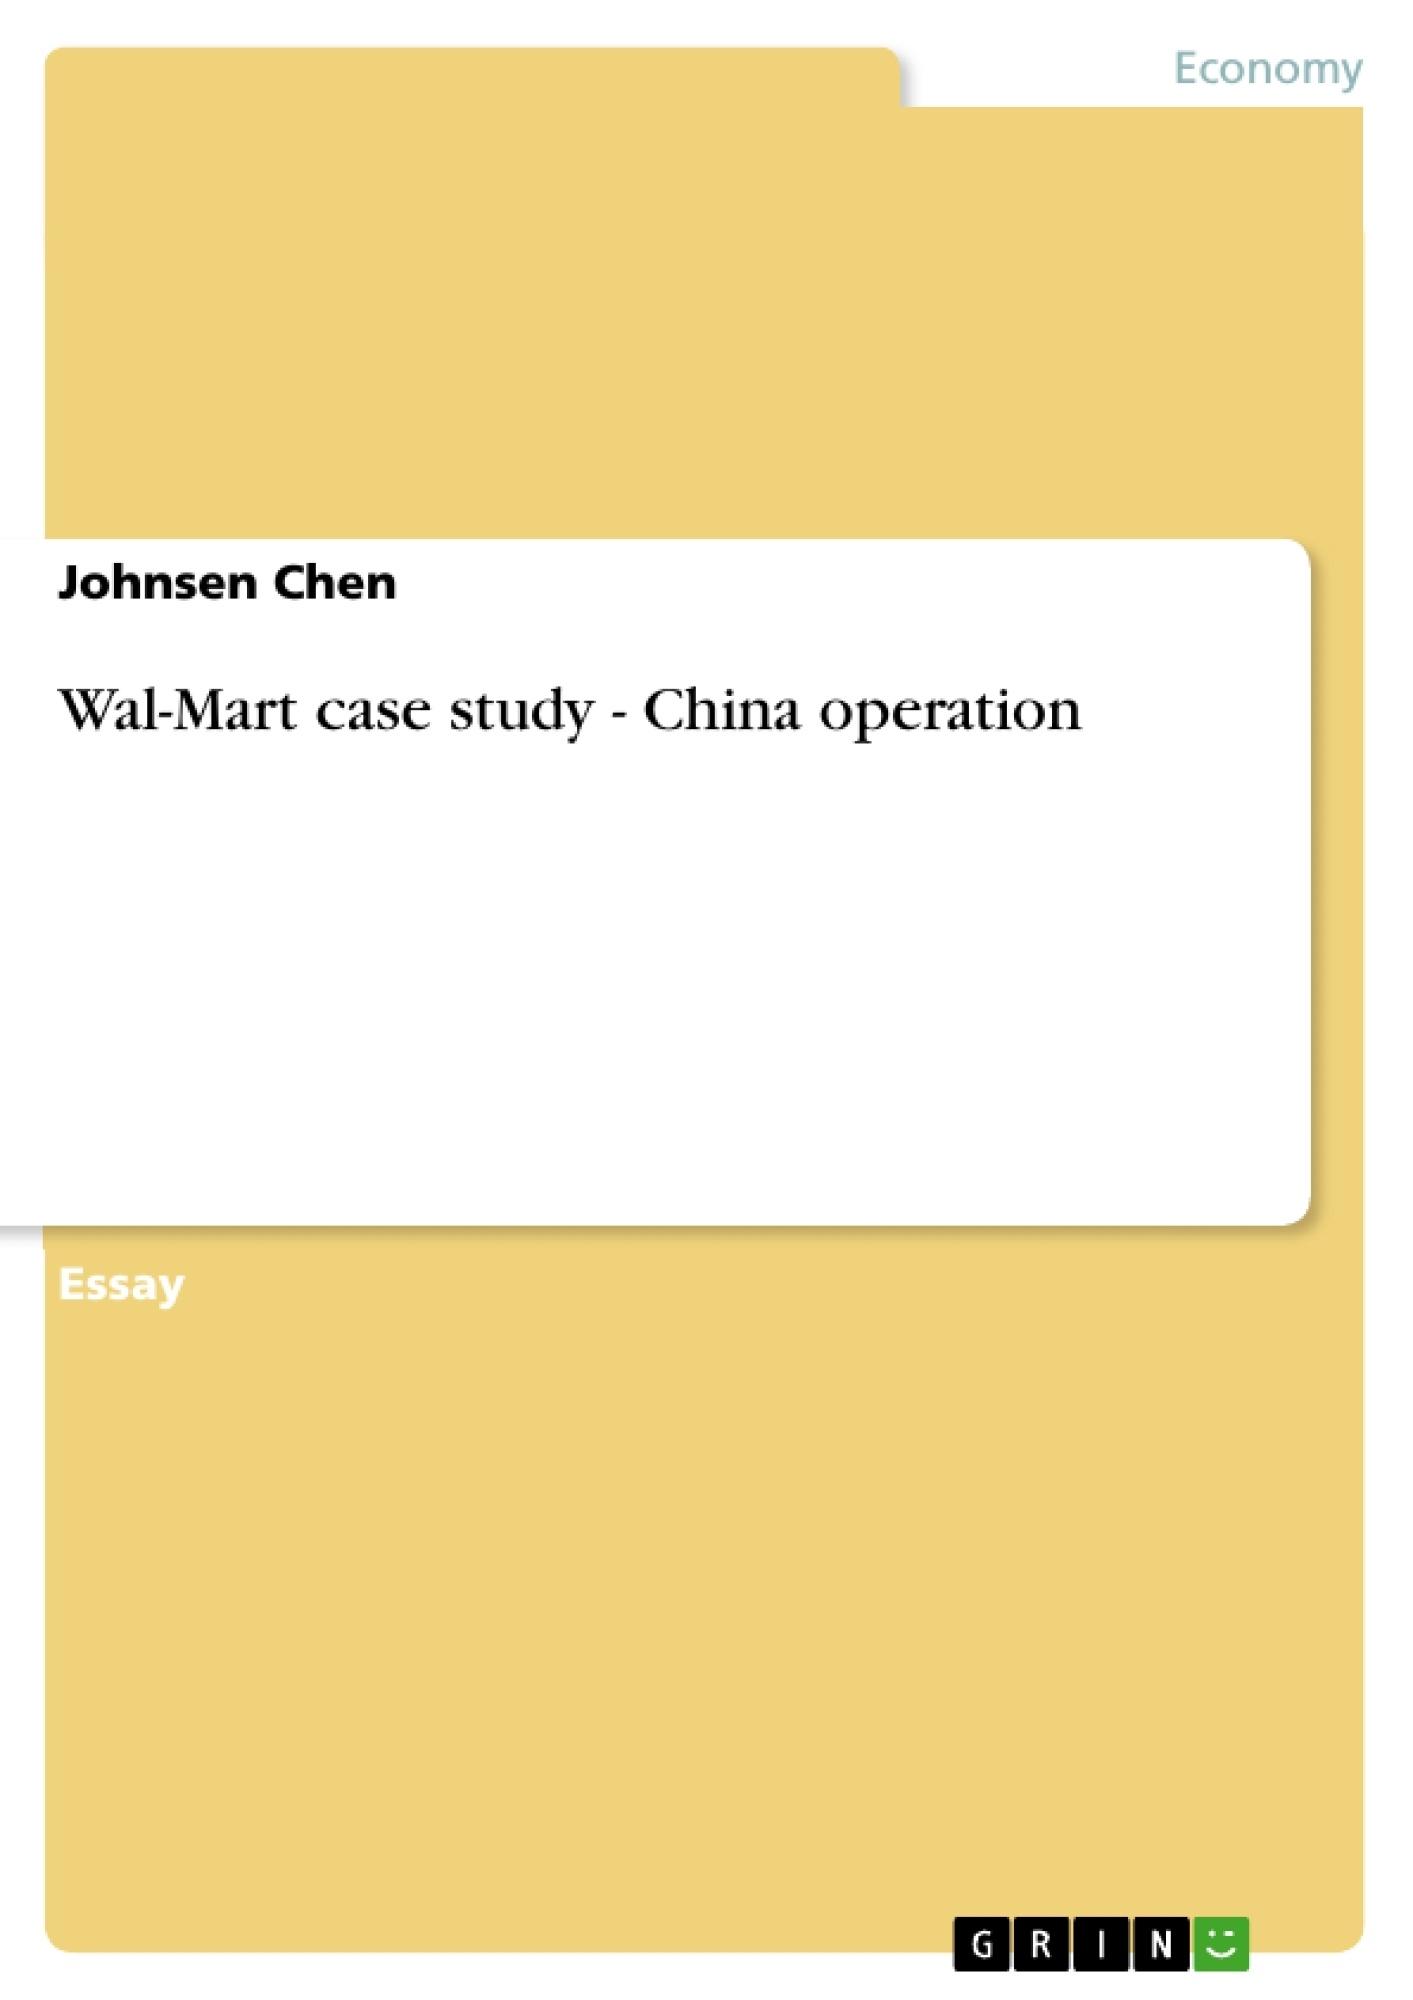 GRIN - Wal-Mart case study - China operation